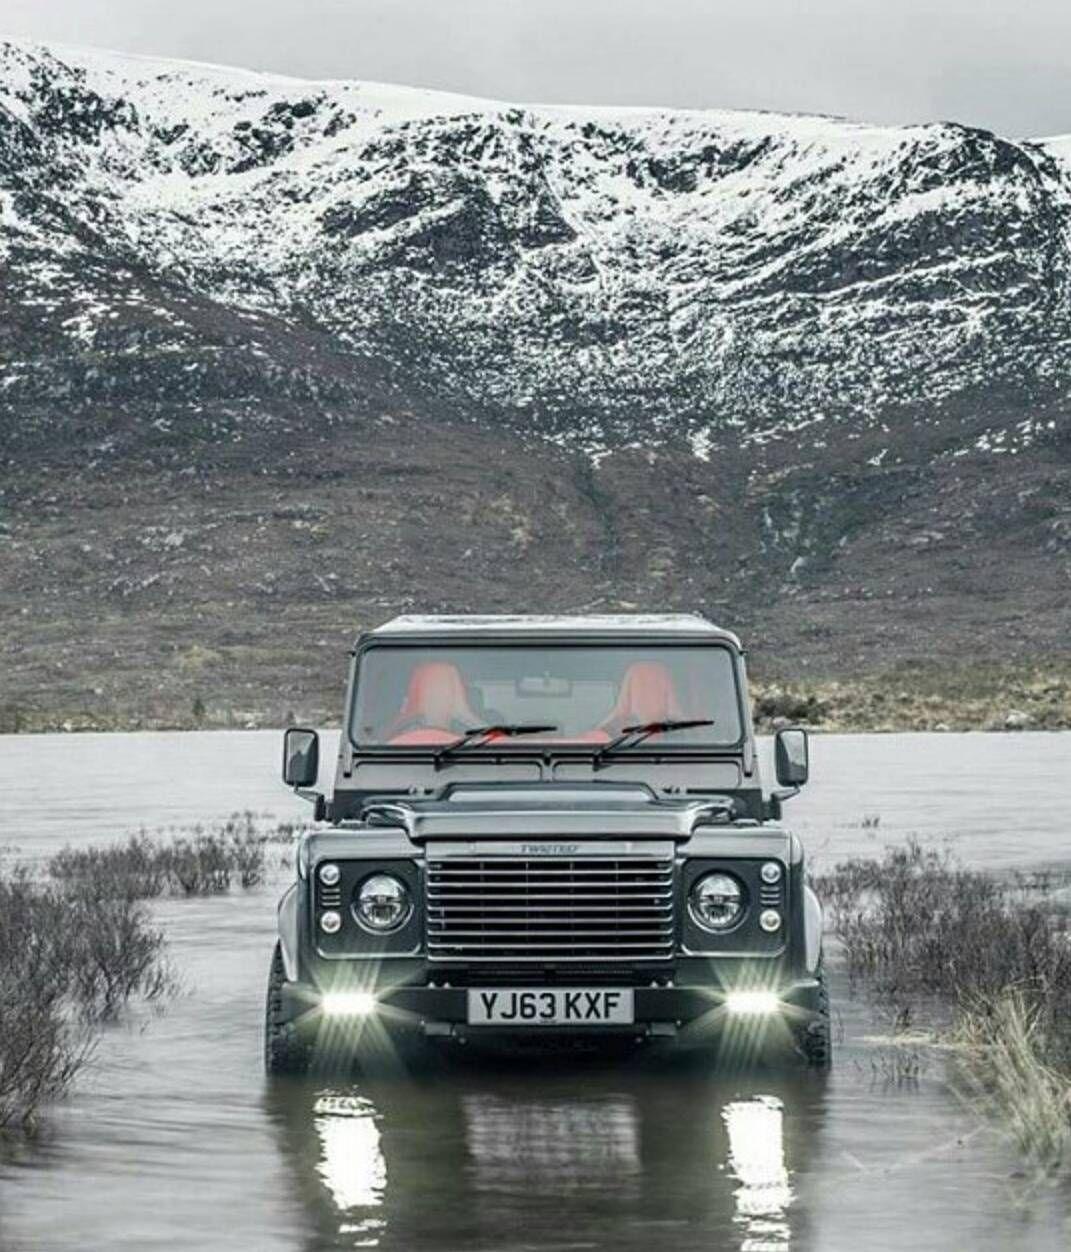 #landrover  #defender !Tira onda ou não? Ham... kkkkkkk... Pqp... belíssima imagem! ... #broffroad #bfgoodrich #offroading #muddy #v8 #4x4 #4wd #dodge #landroverdefender #f150 #raptor #kingsuspension #fox #black #fosco #toyotires #maxxis #trucks #offroad by broffroad #landrover  #defender !Tira onda ou não? Ham... kkkkkkk... Pqp... belíssima imagem! ... #broffroad #bfgoodrich #offroading #muddy #v8 #4x4 #4wd #dodge #landroverdefender #f150 #raptor #kingsuspension #fox #black #fosco…